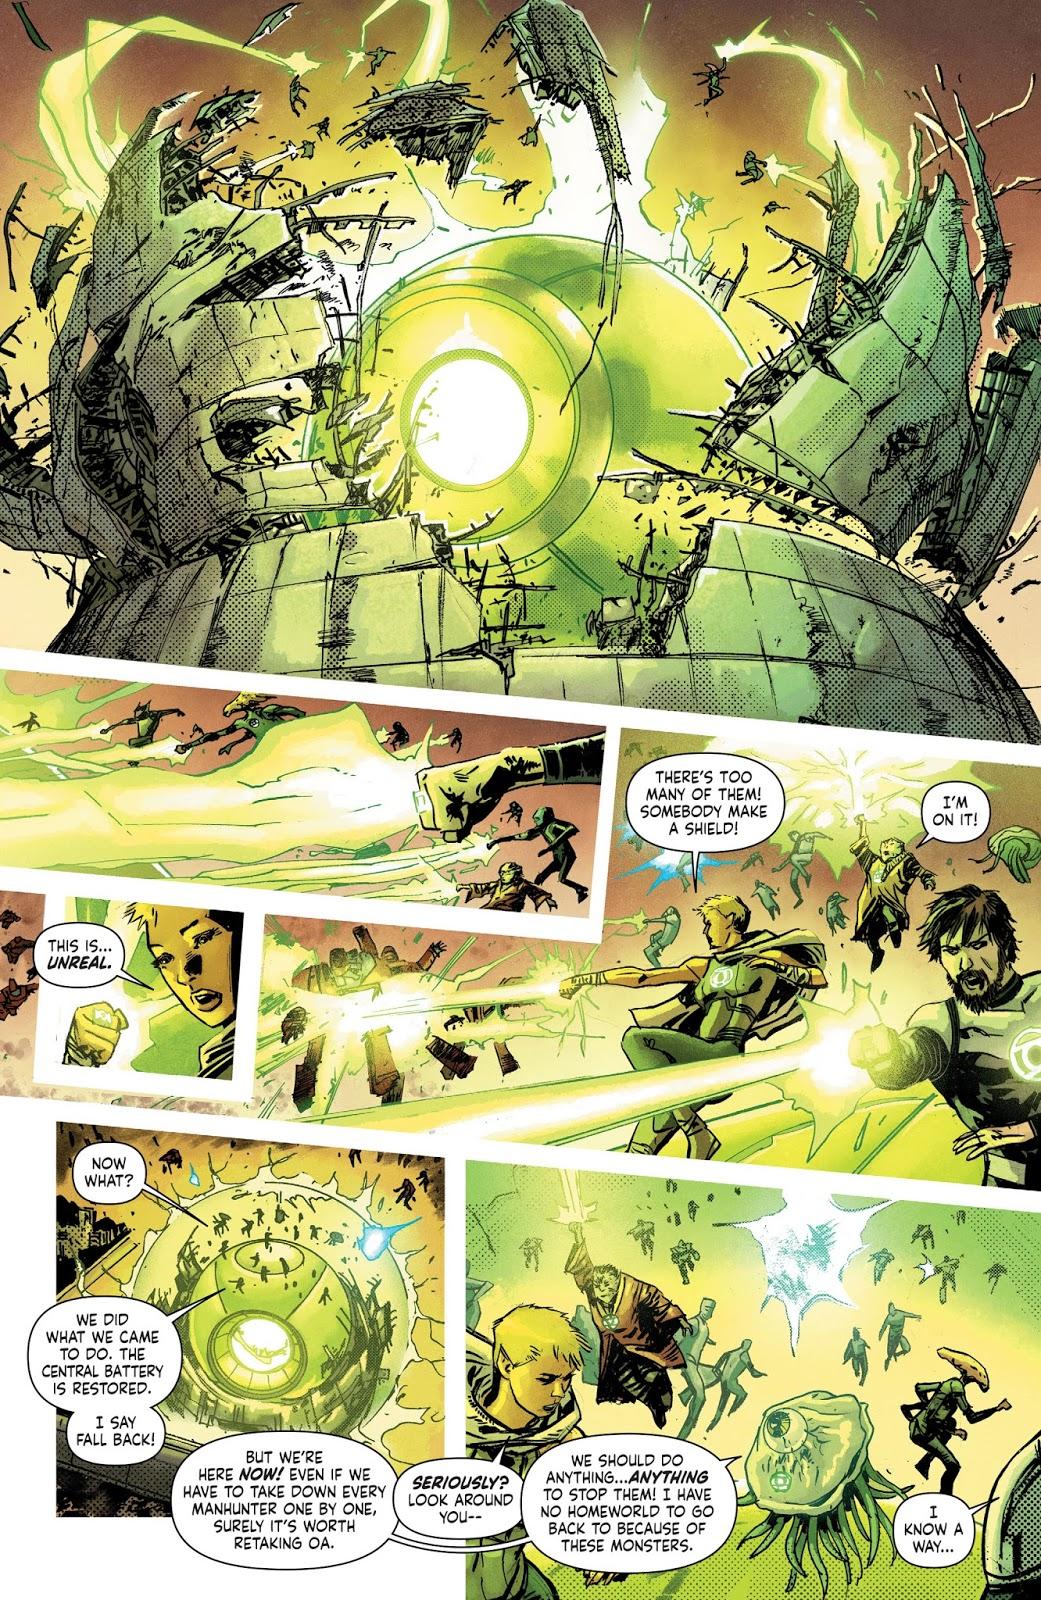 Green-Lantern-Corps-VS-Manhunters-Earth-1